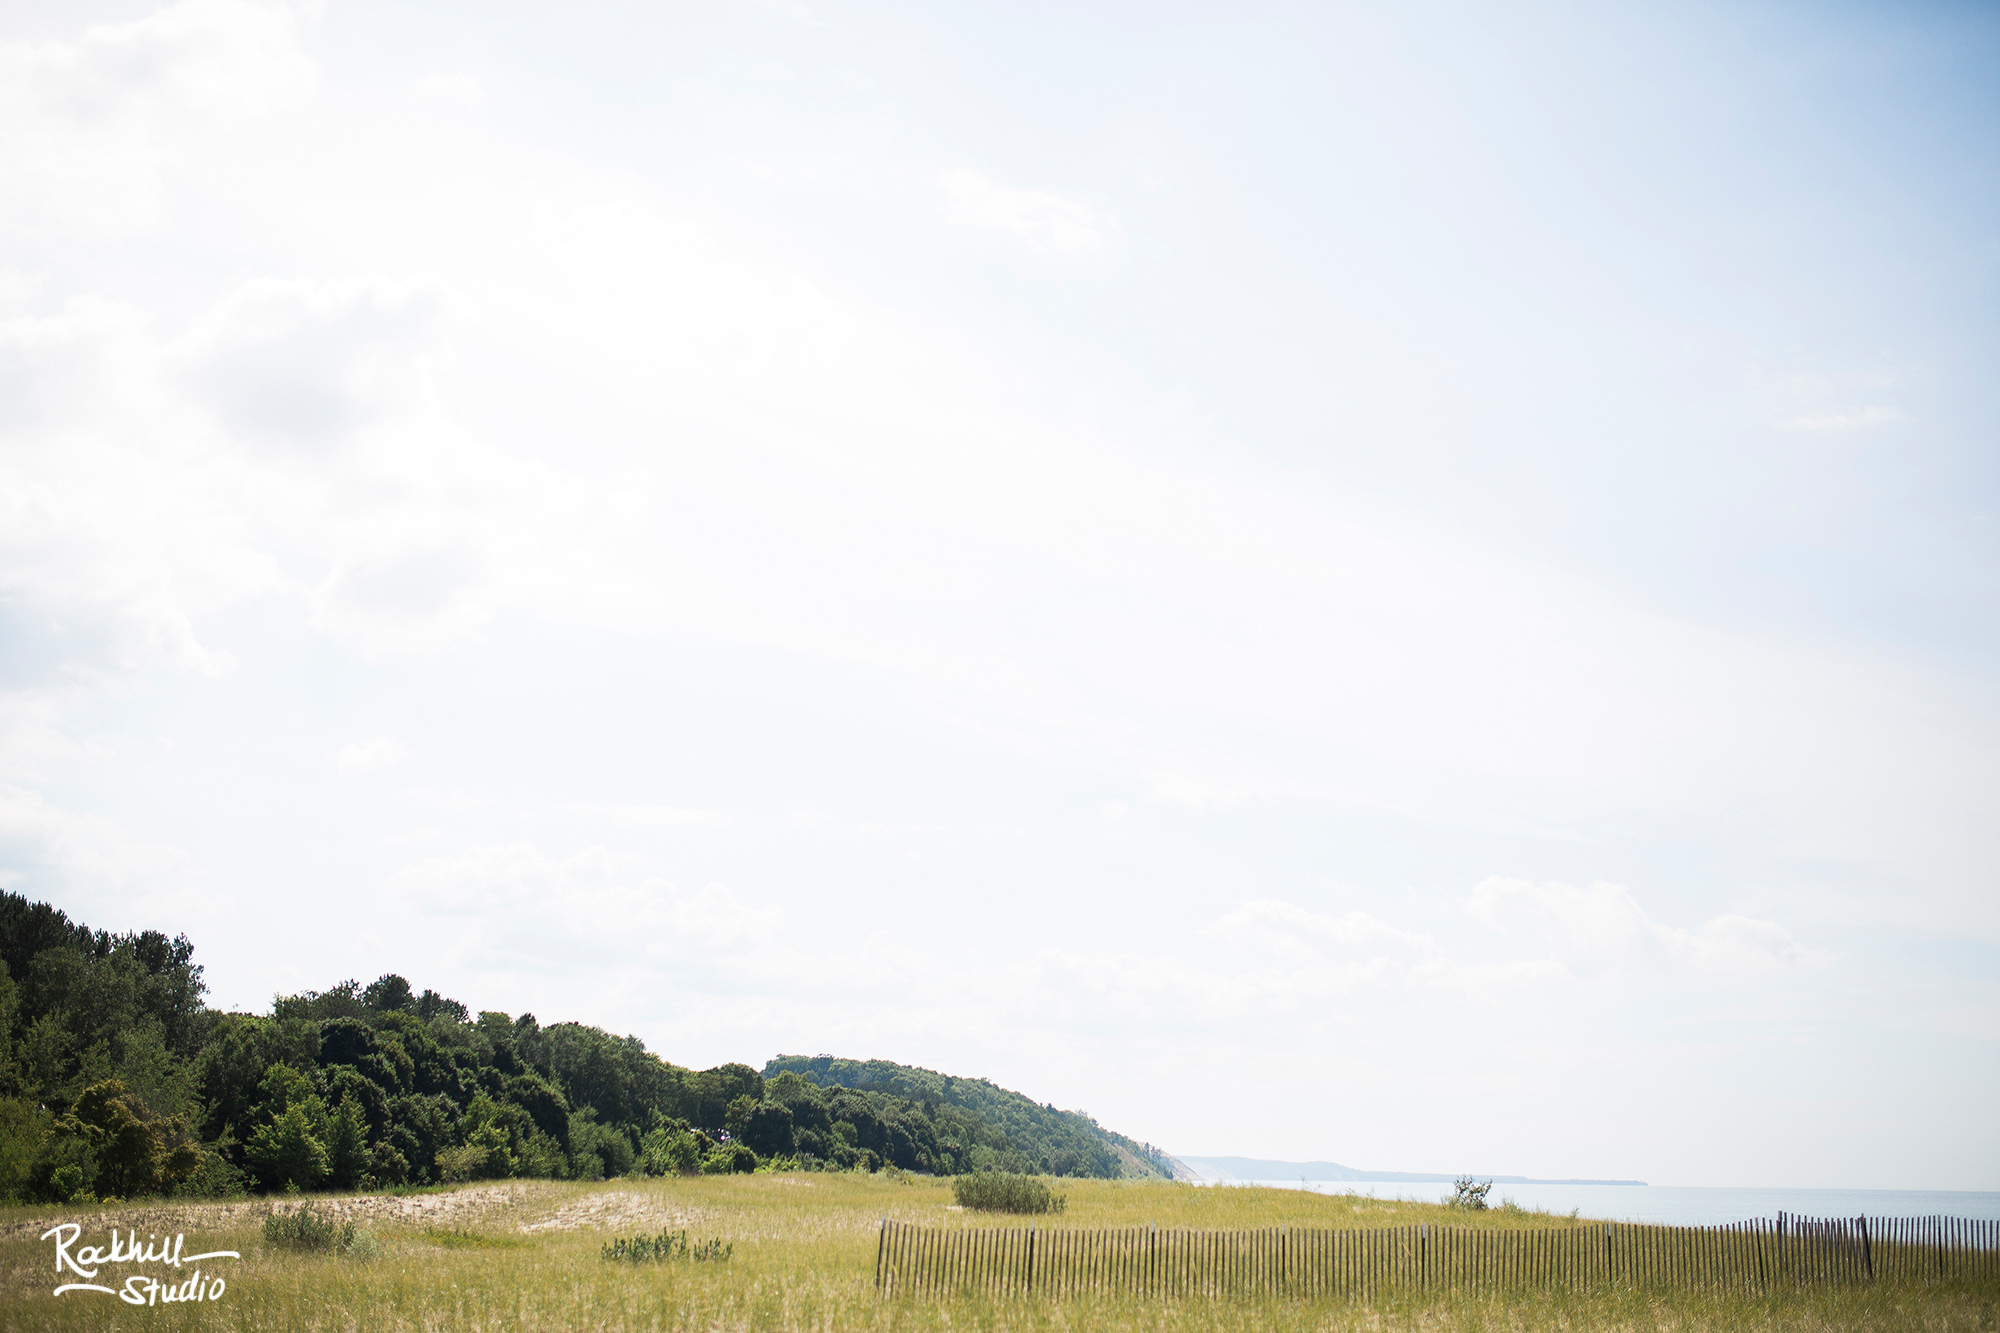 grand-marais-wedding-photography-upper-peninsula-northern-michigan-rockhill-30.jpg